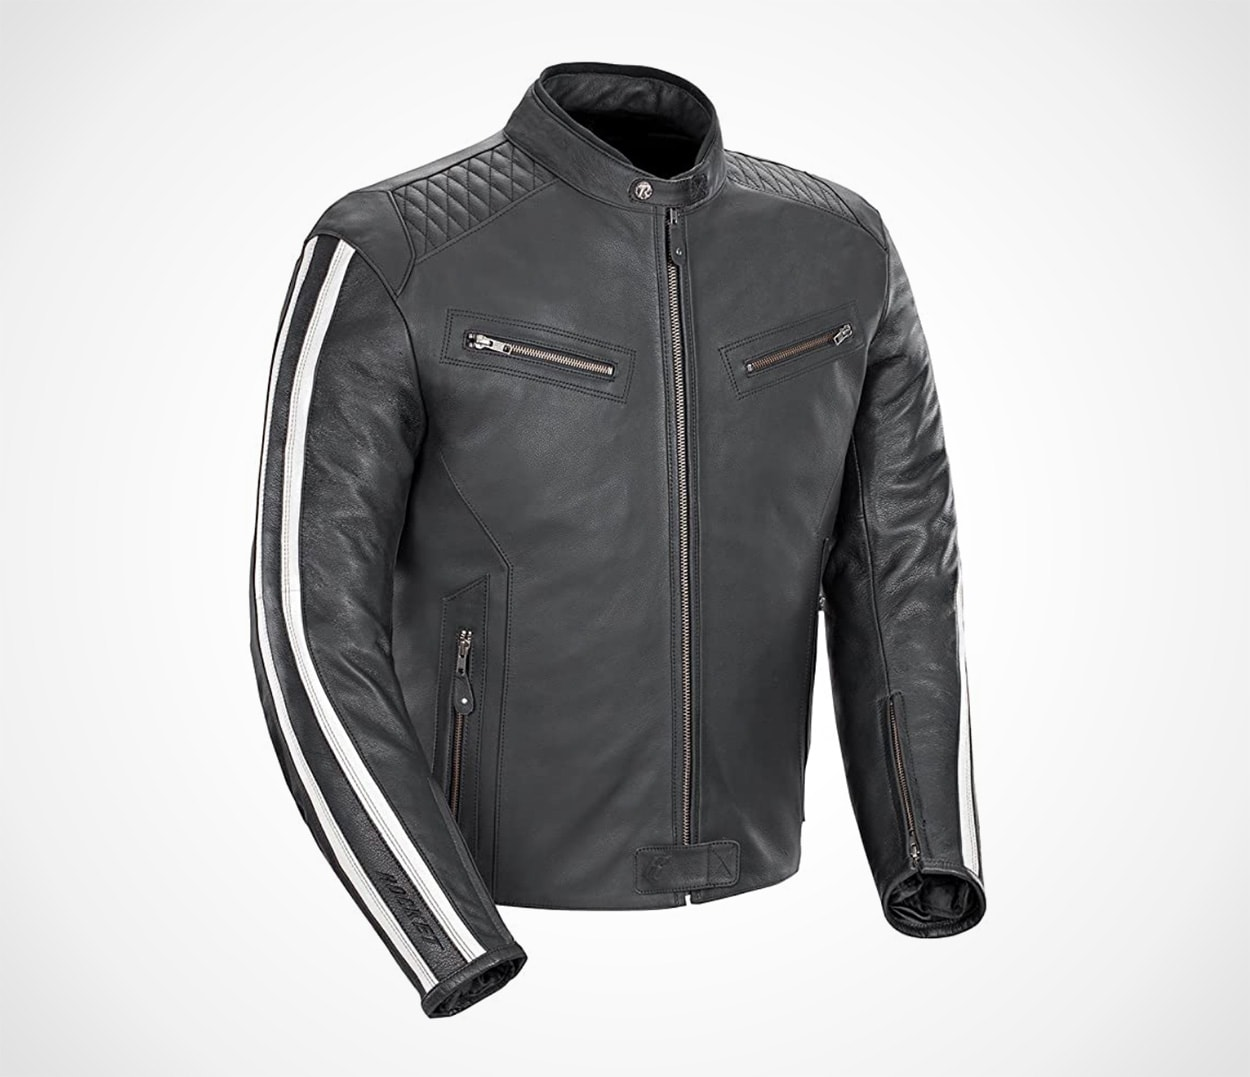 Joe Rocket Vintage Rocket Men's Black Leather Motorcycle Jacket